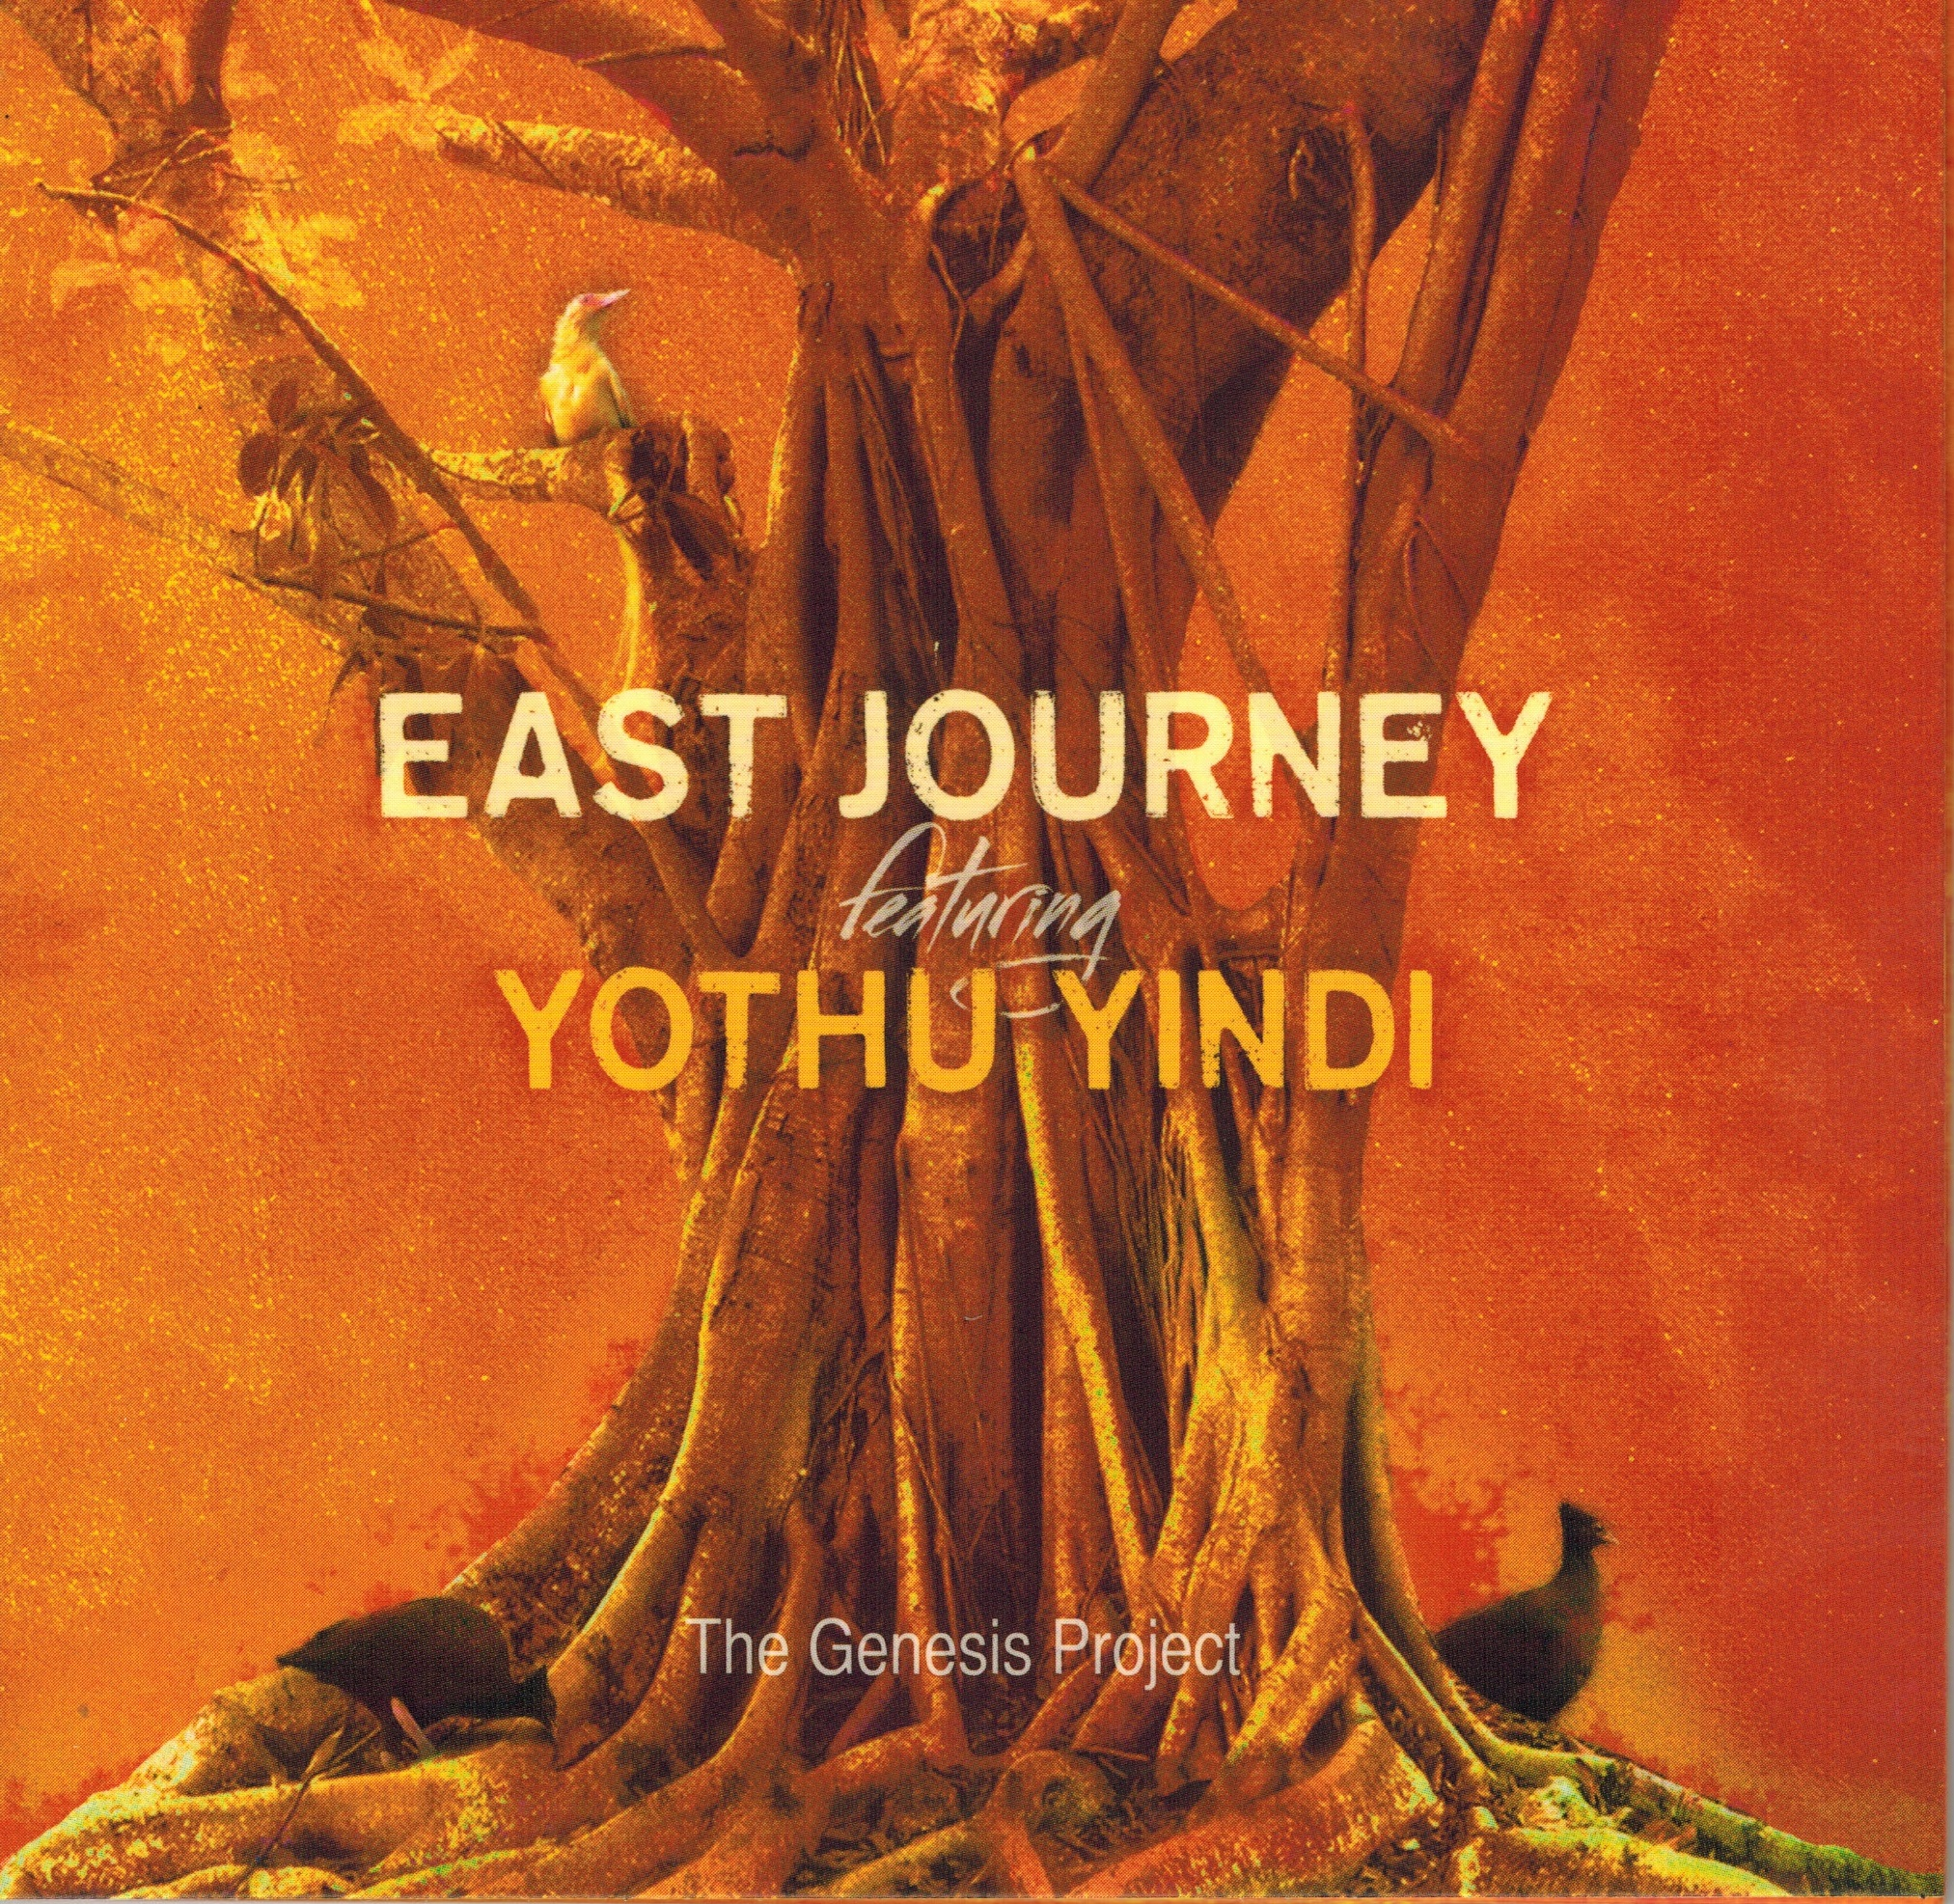 East Journey Pic Monday.jpg